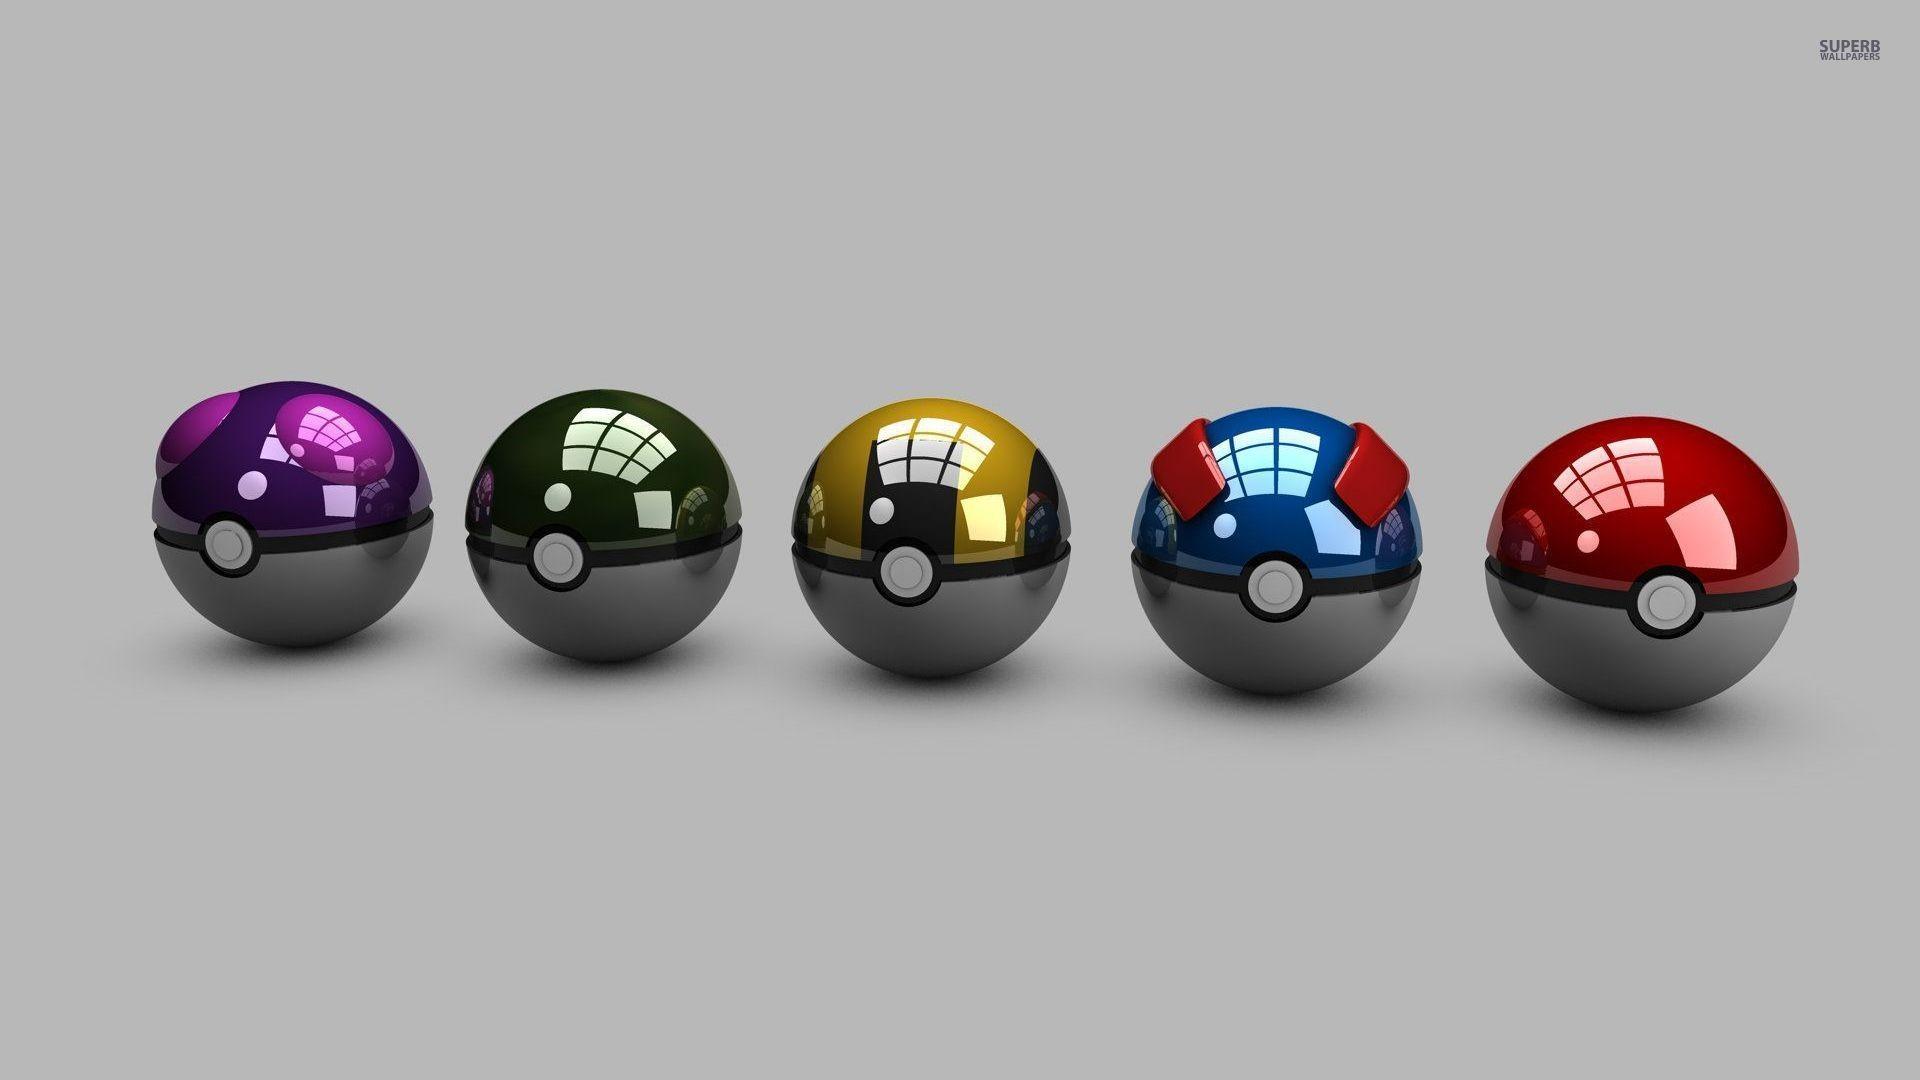 pokeballs 1920×1080